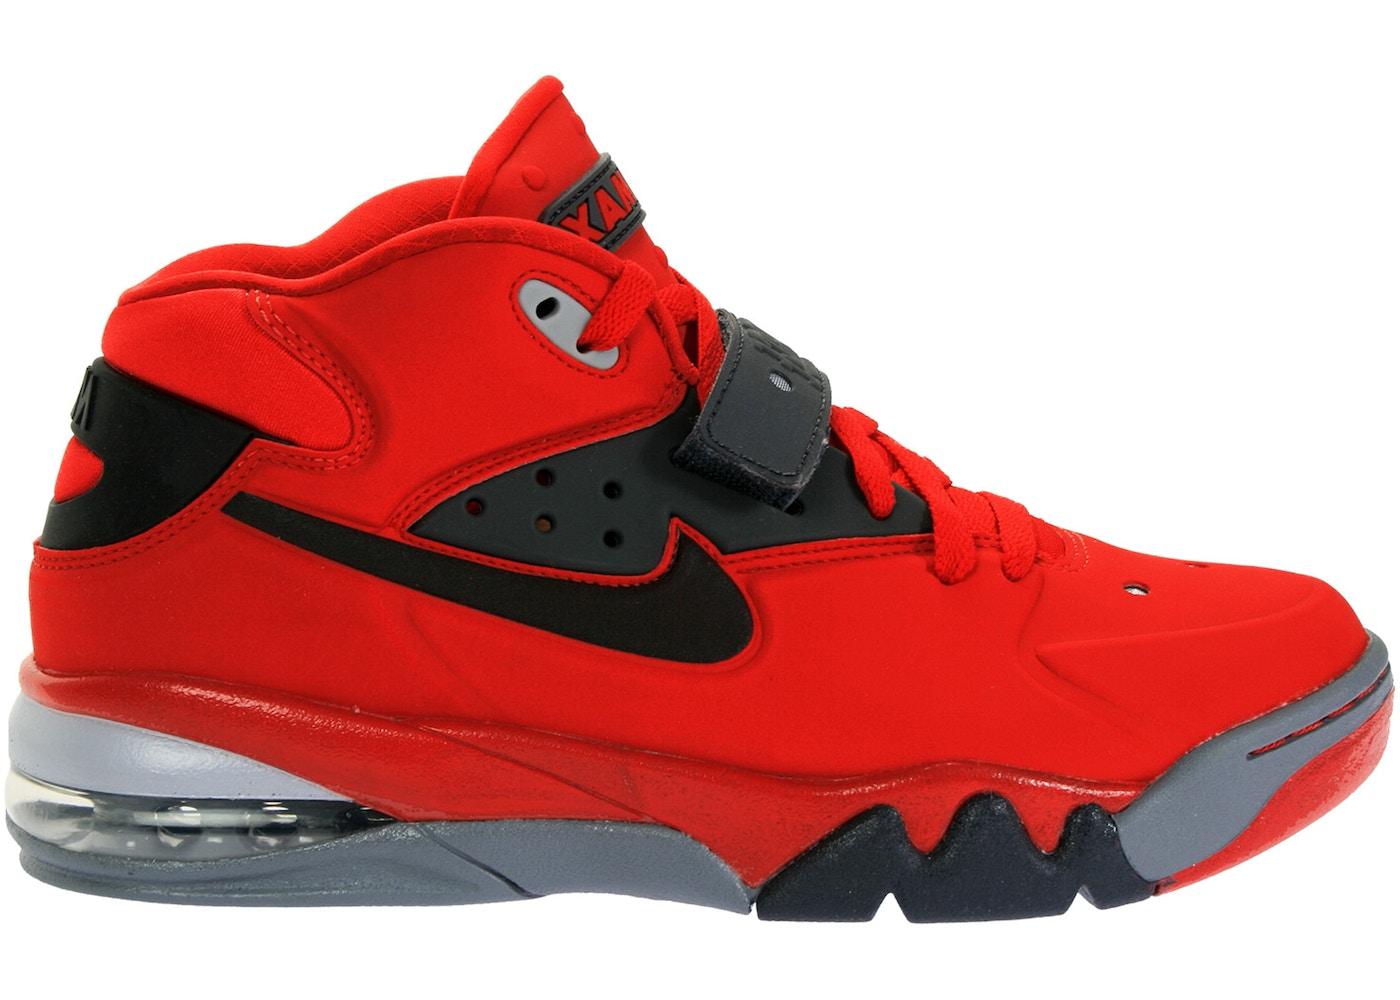 Remo hablar Previamente  Nike Air Force Max 2013 University Red Black - 555105-600